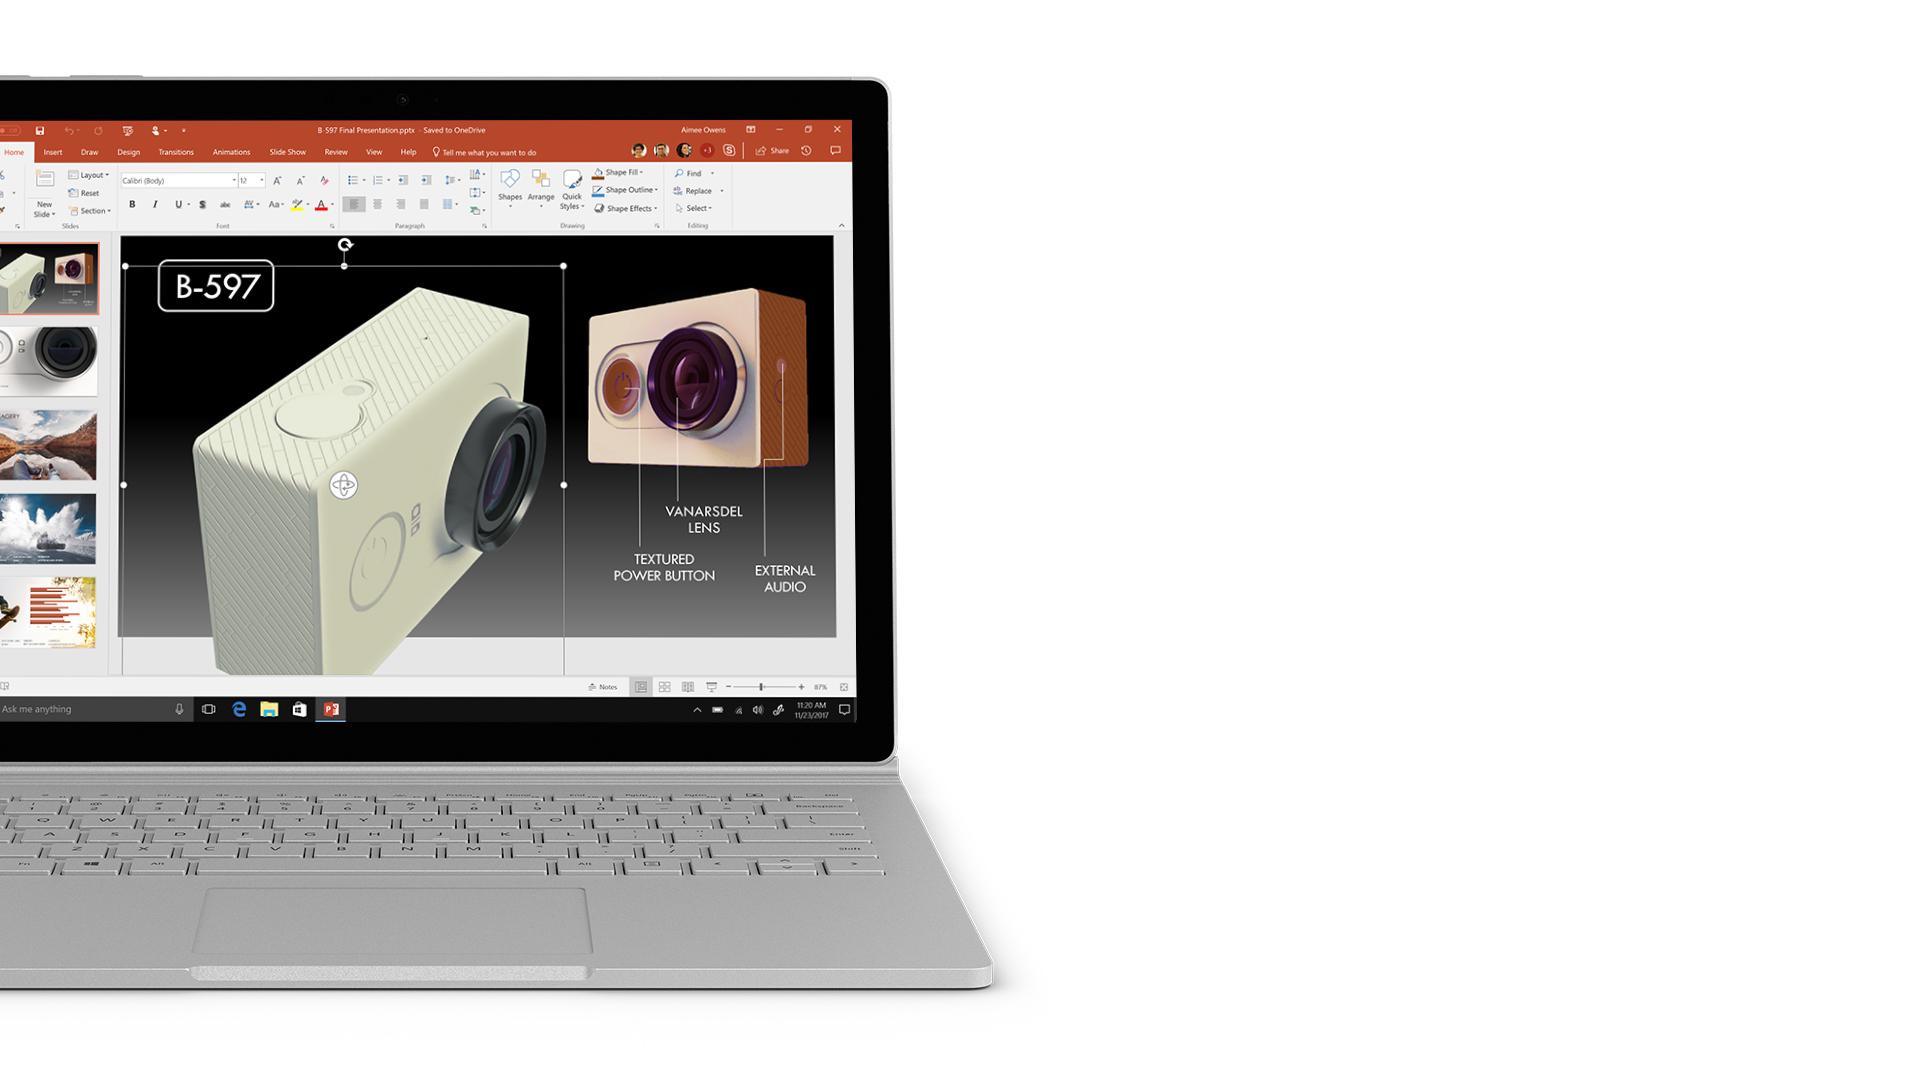 PowerPoint-skærmbillede på Surface.